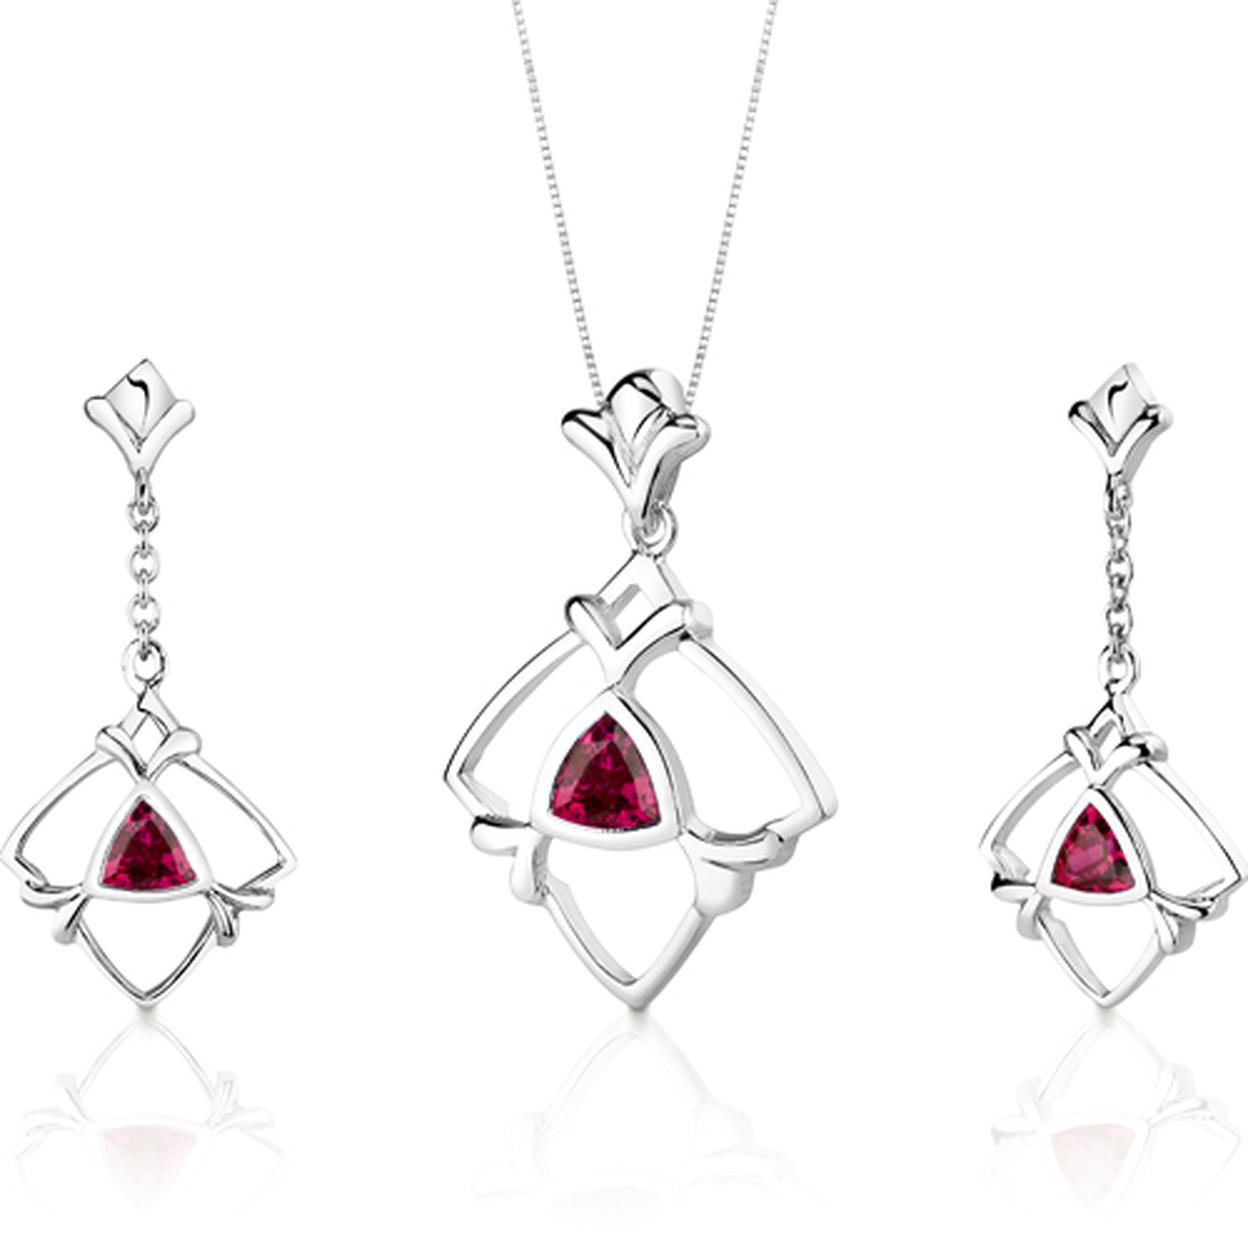 Artful 2.25 Carats Trillion Cut Sterling Silver Ruby Pendant Earrings Set Style Ss3134